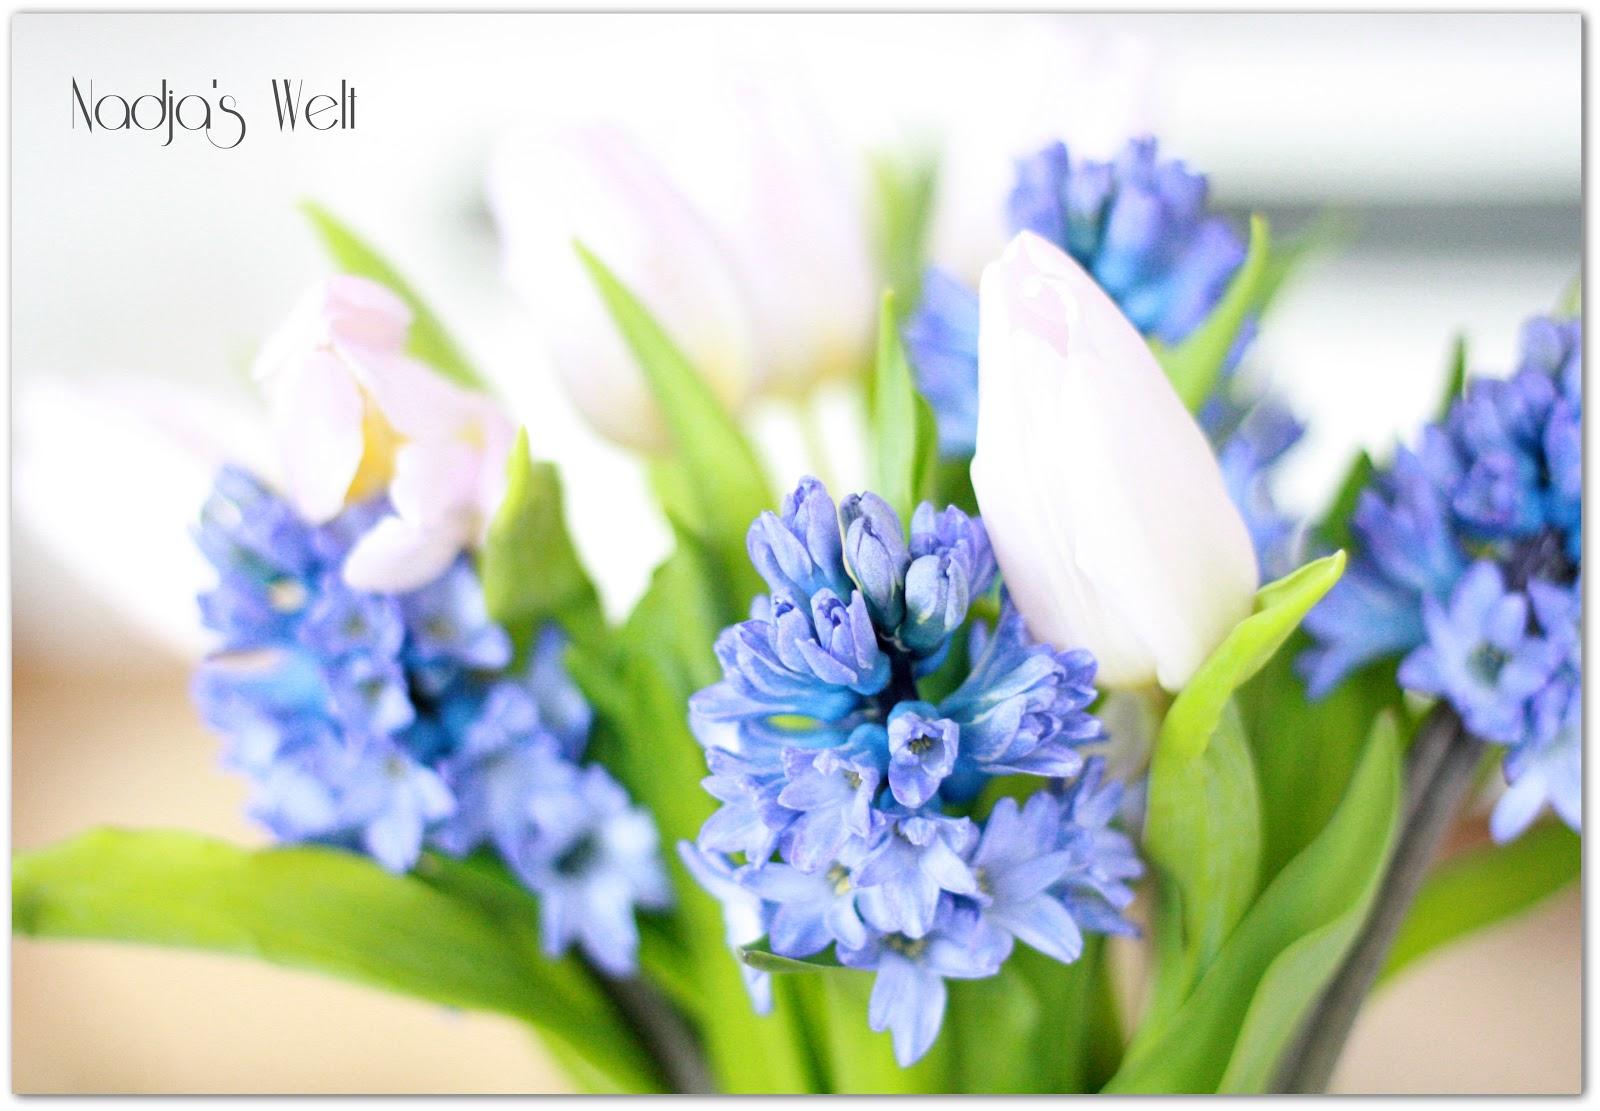 Nadjas Welt A little like Spring